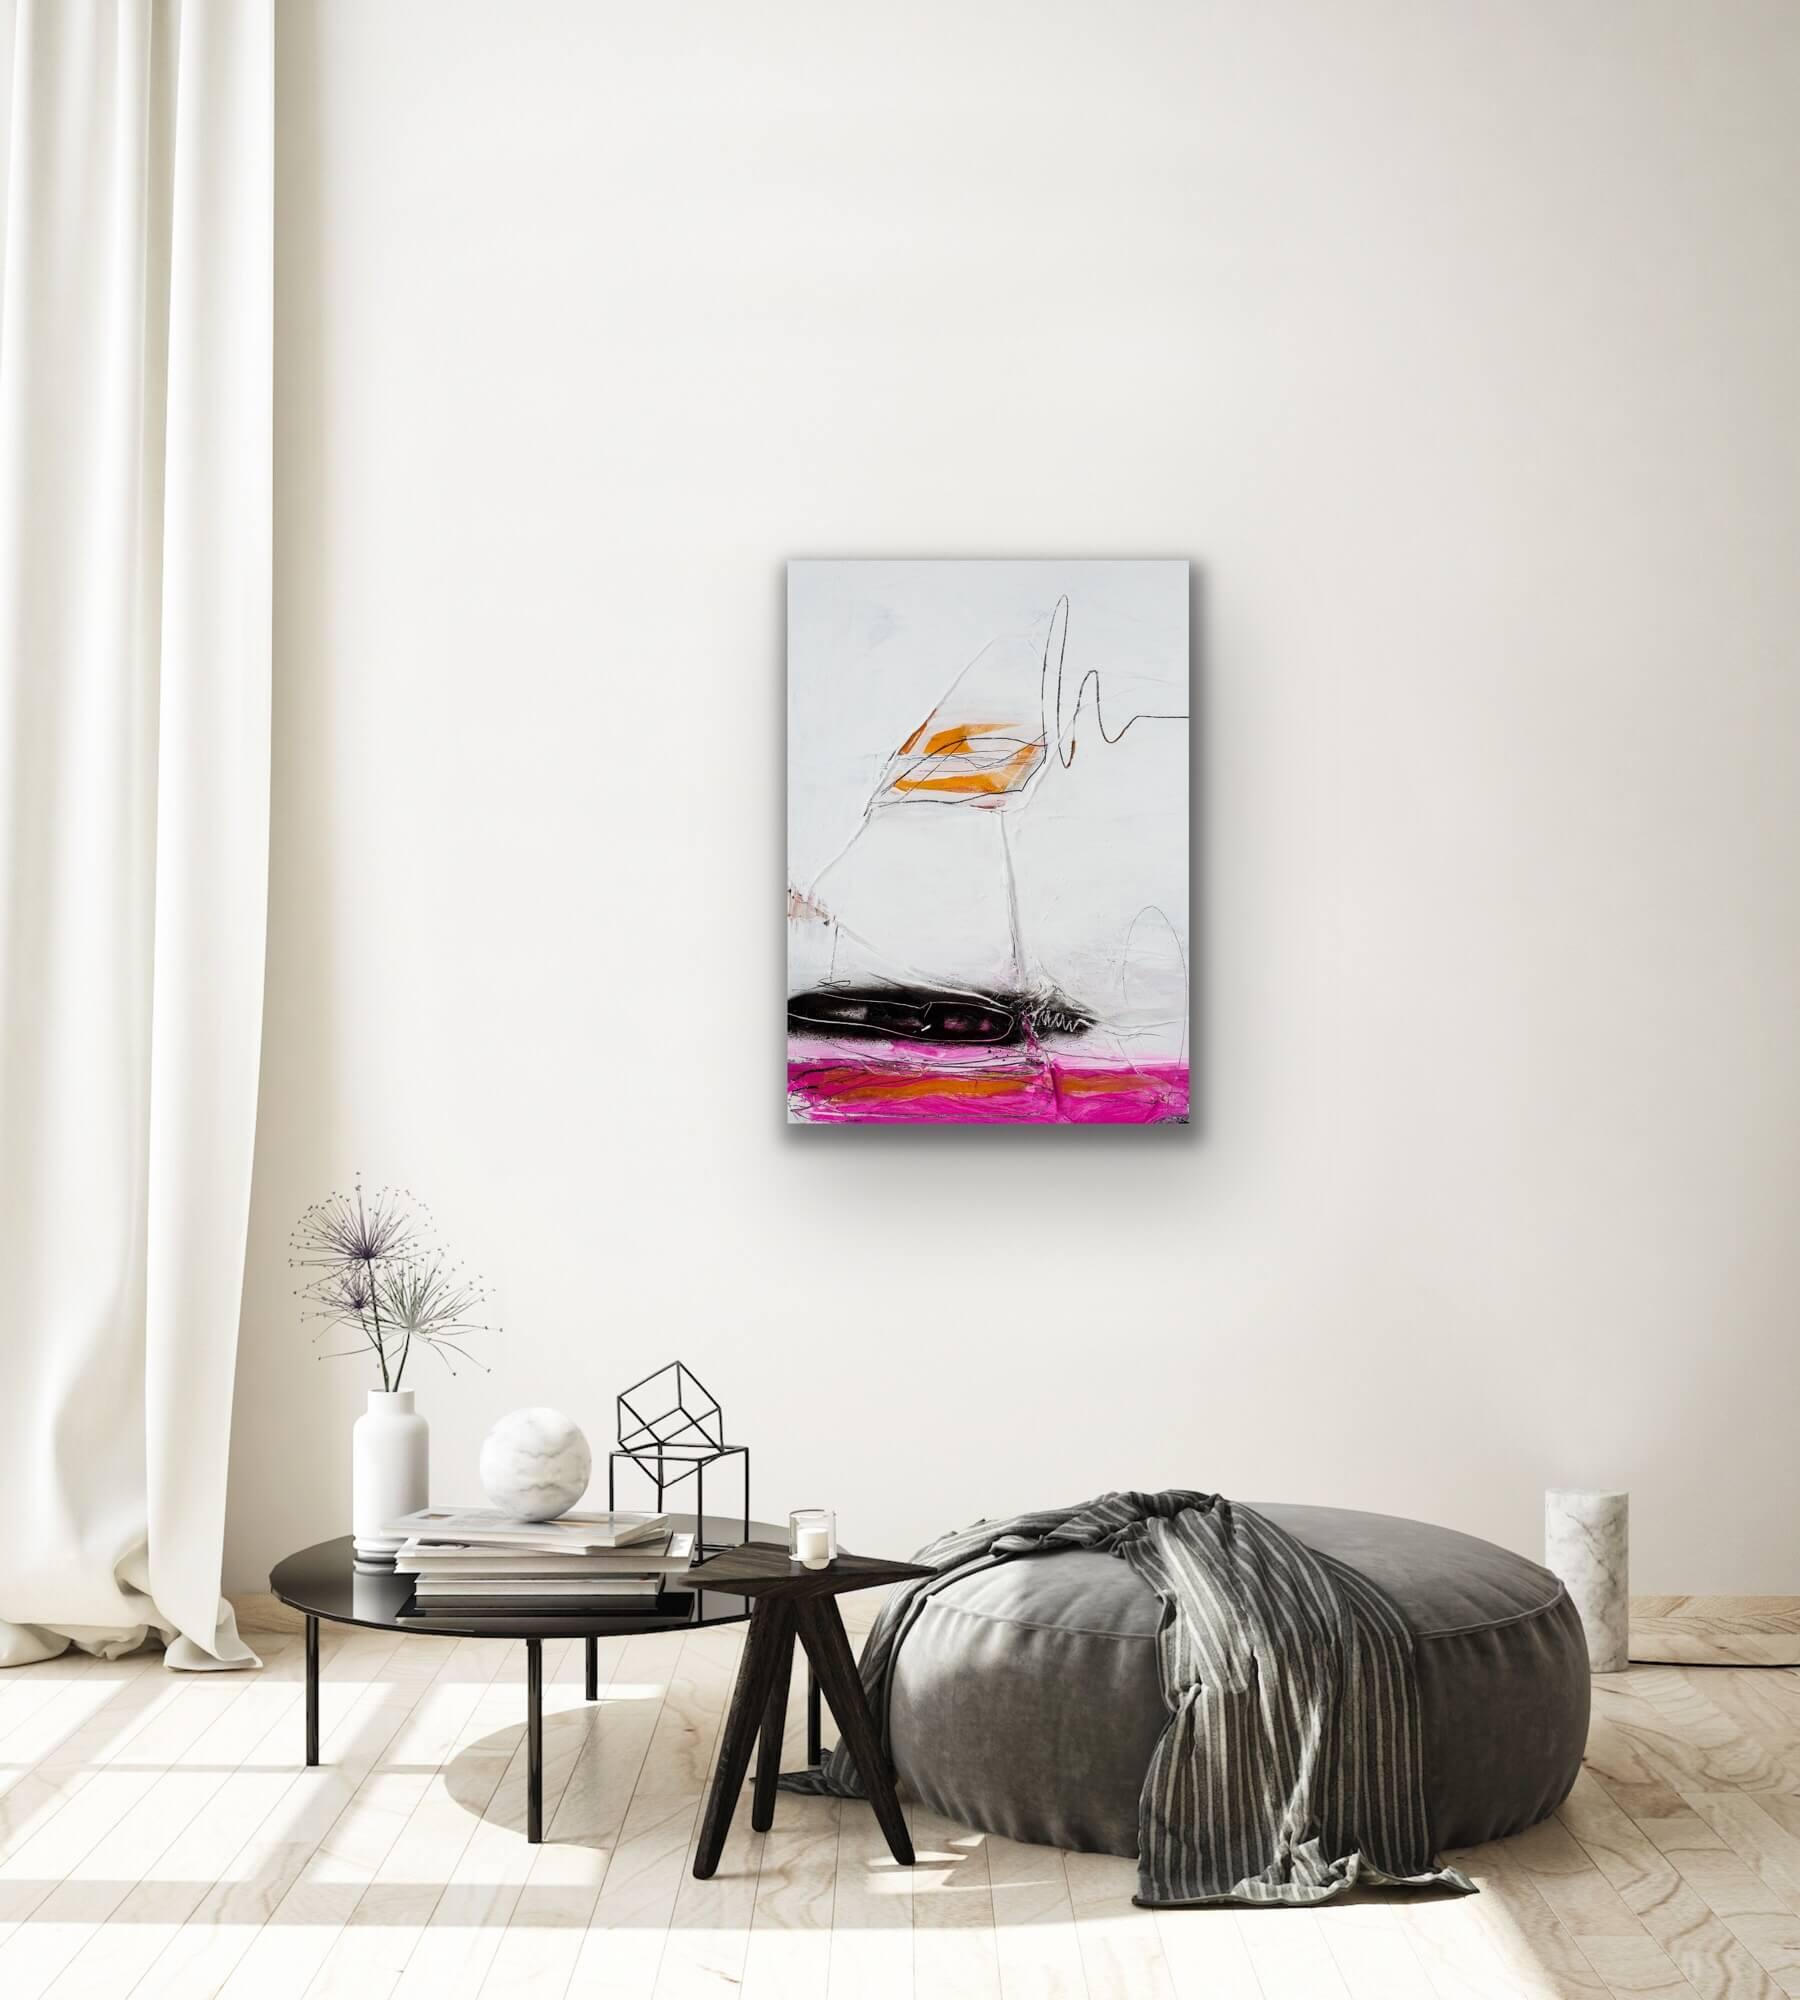 solid foundation my light shines brightly Petronilla Hohenwarter artist